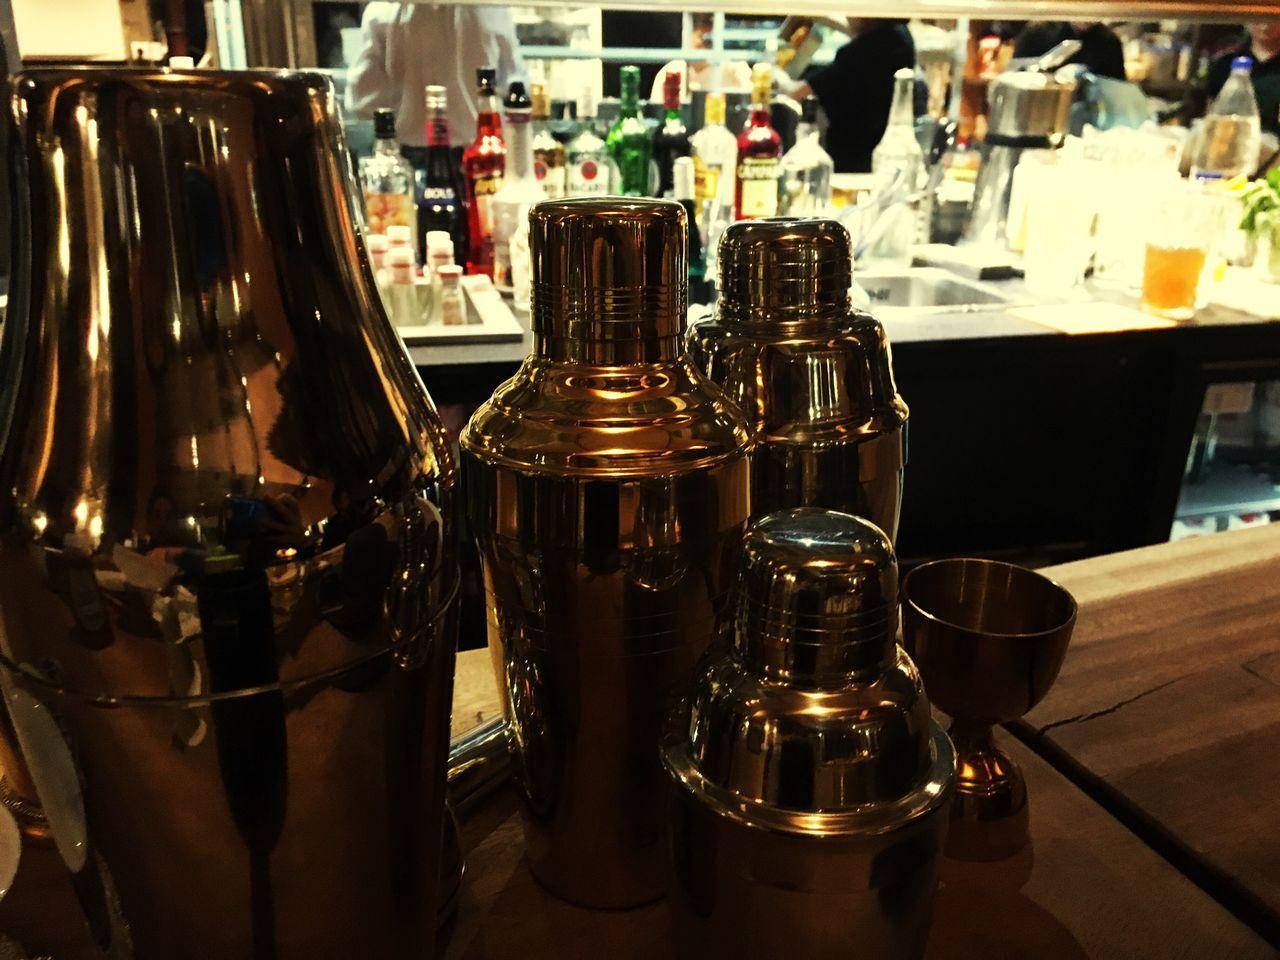 Bar No People Alcohol Shakers Shaker Drink Metallic Shiny Restaurant